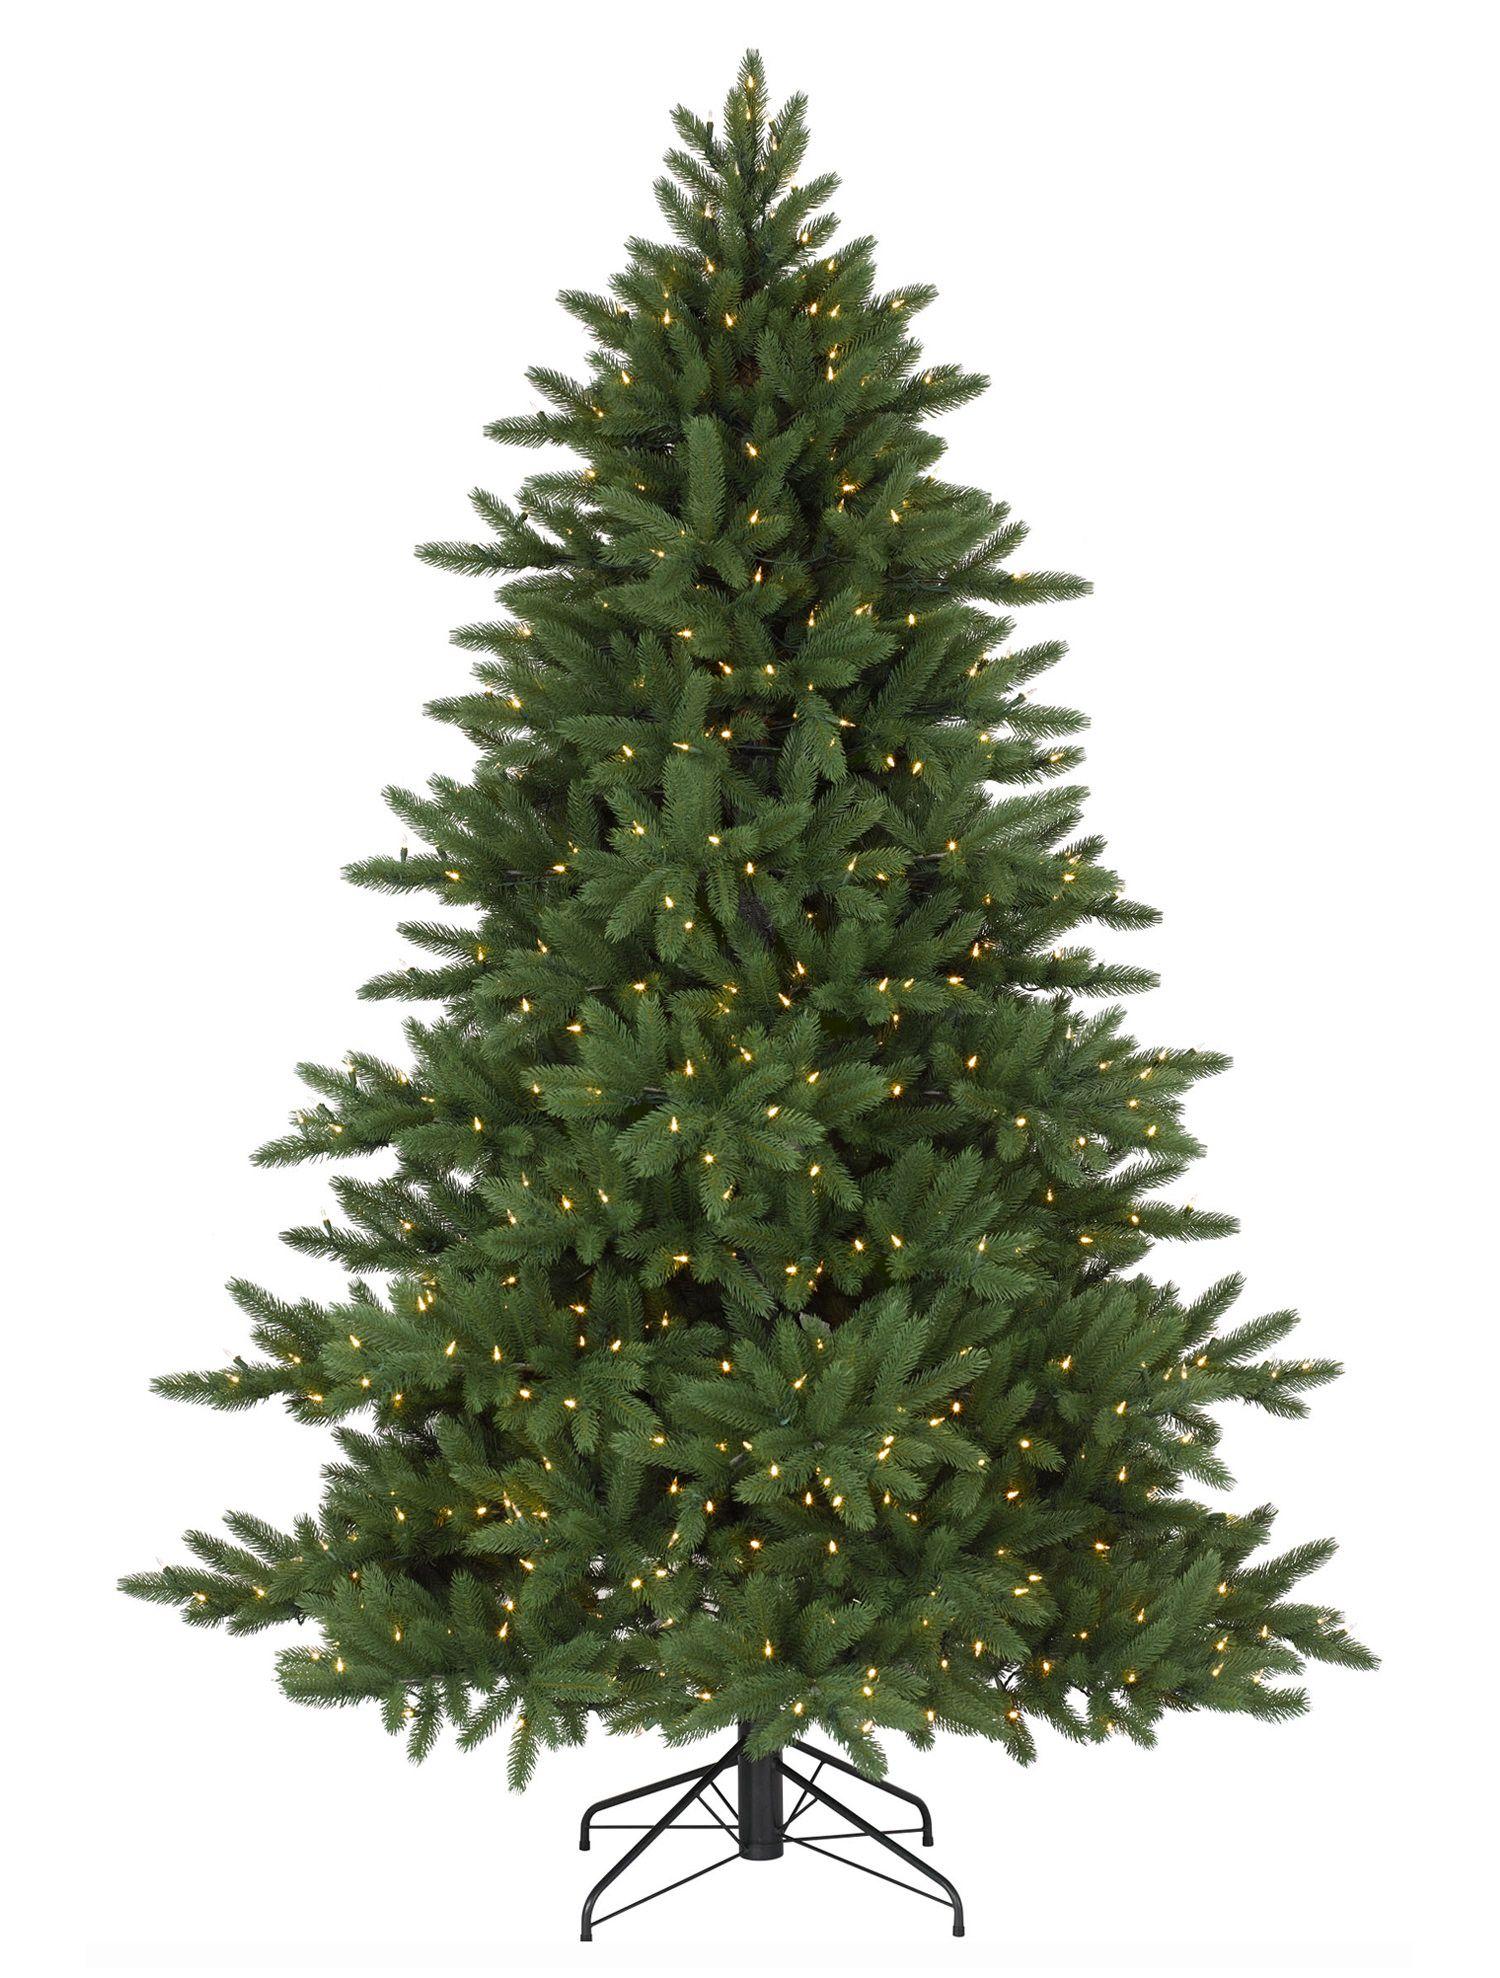 Castle Peak Pine Artificial Christmas Tree | Holiday | Pinterest ...